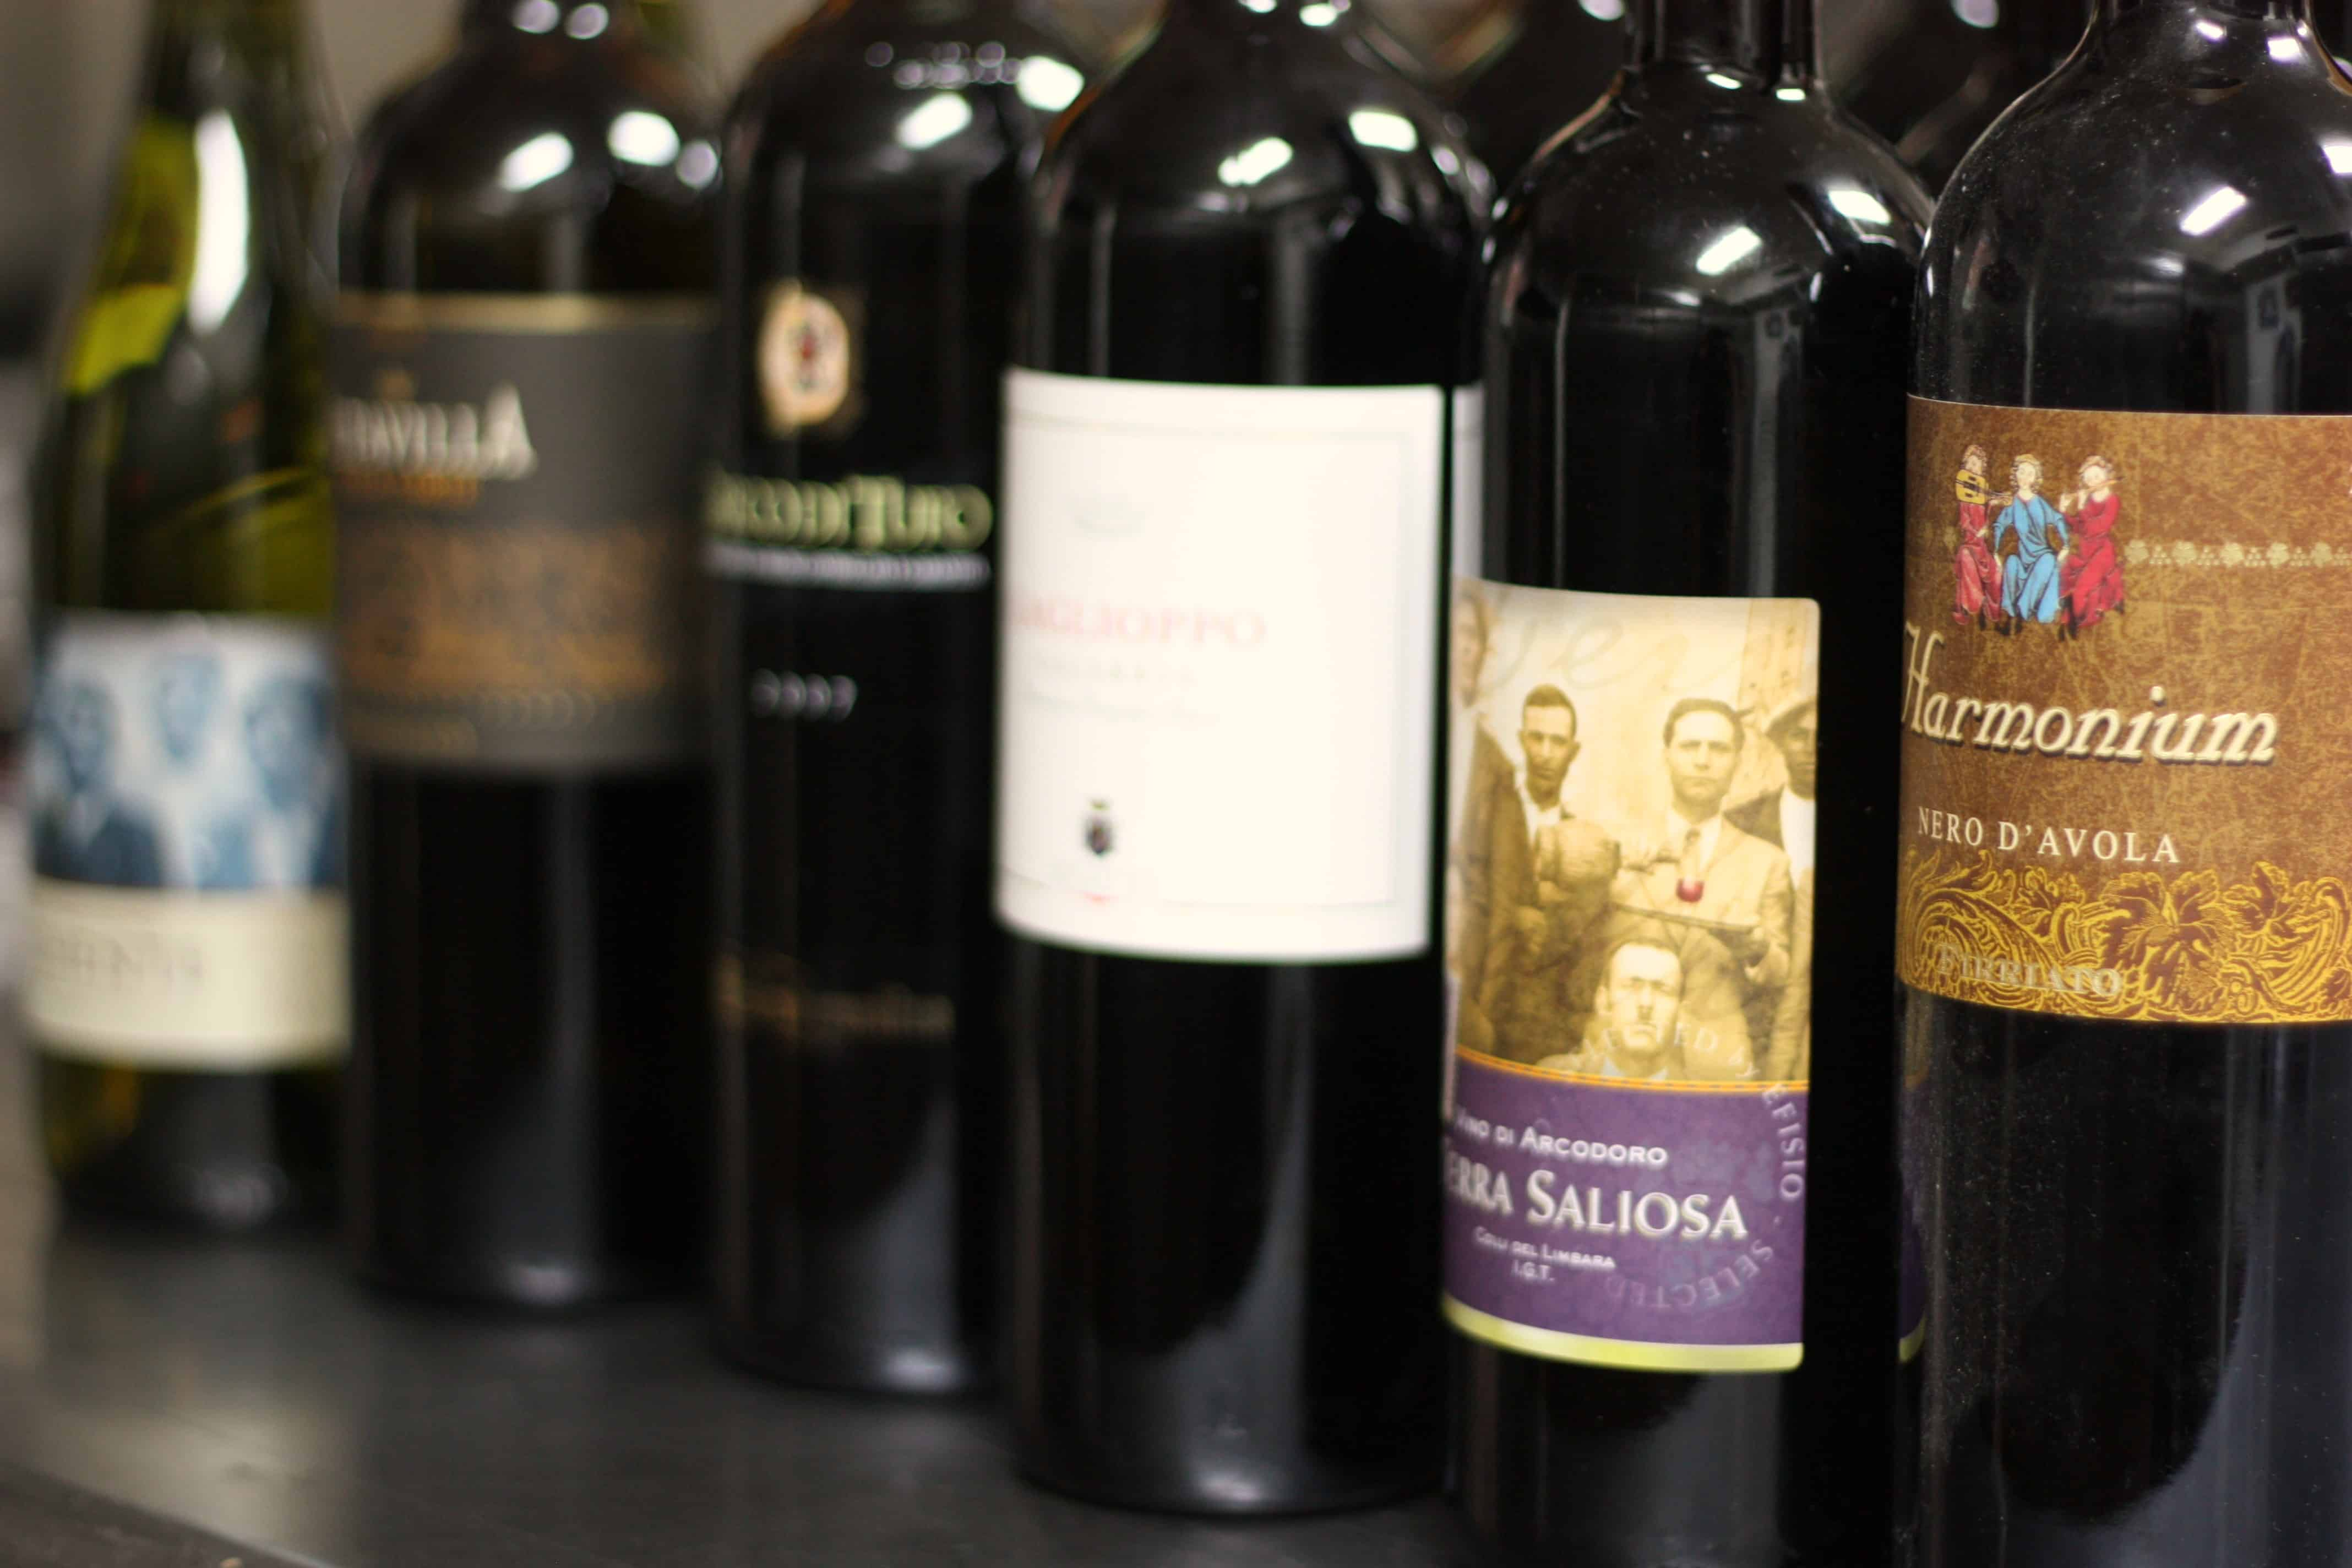 Wine & Food:  Sicilia, Sardegna, and Calabria 1